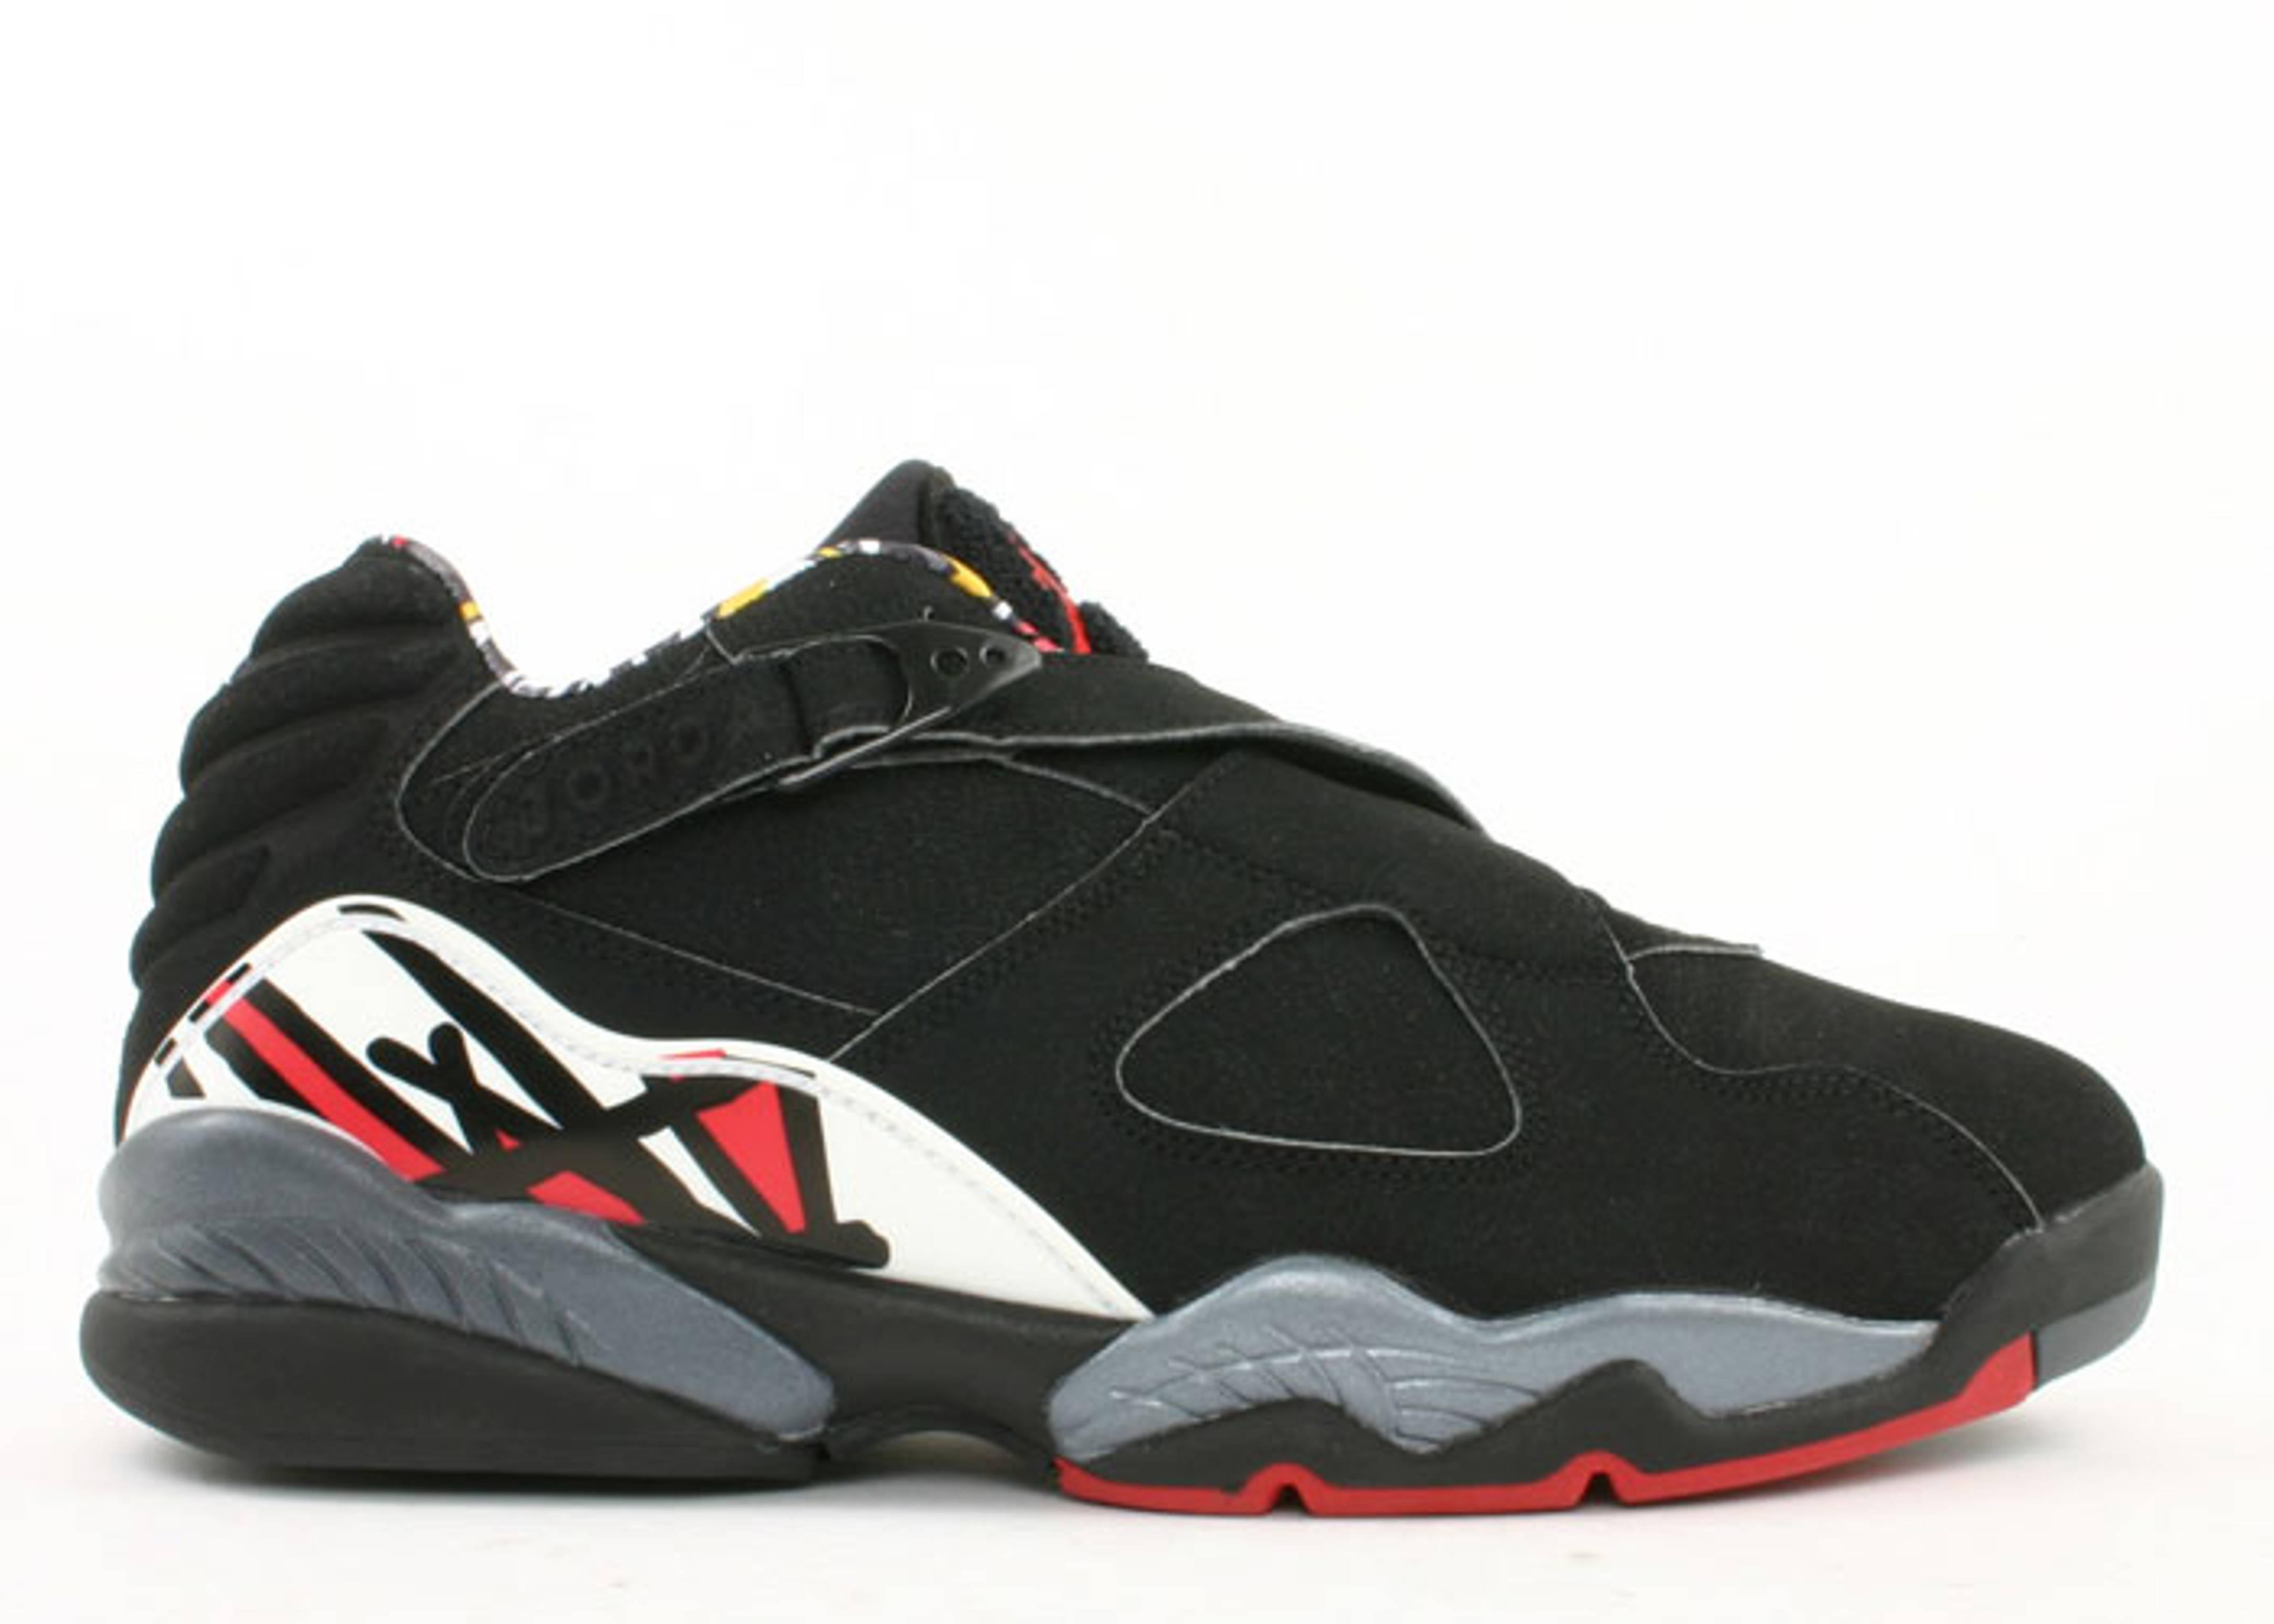 213f60b797a19b Air Jordan 8 Retro Low